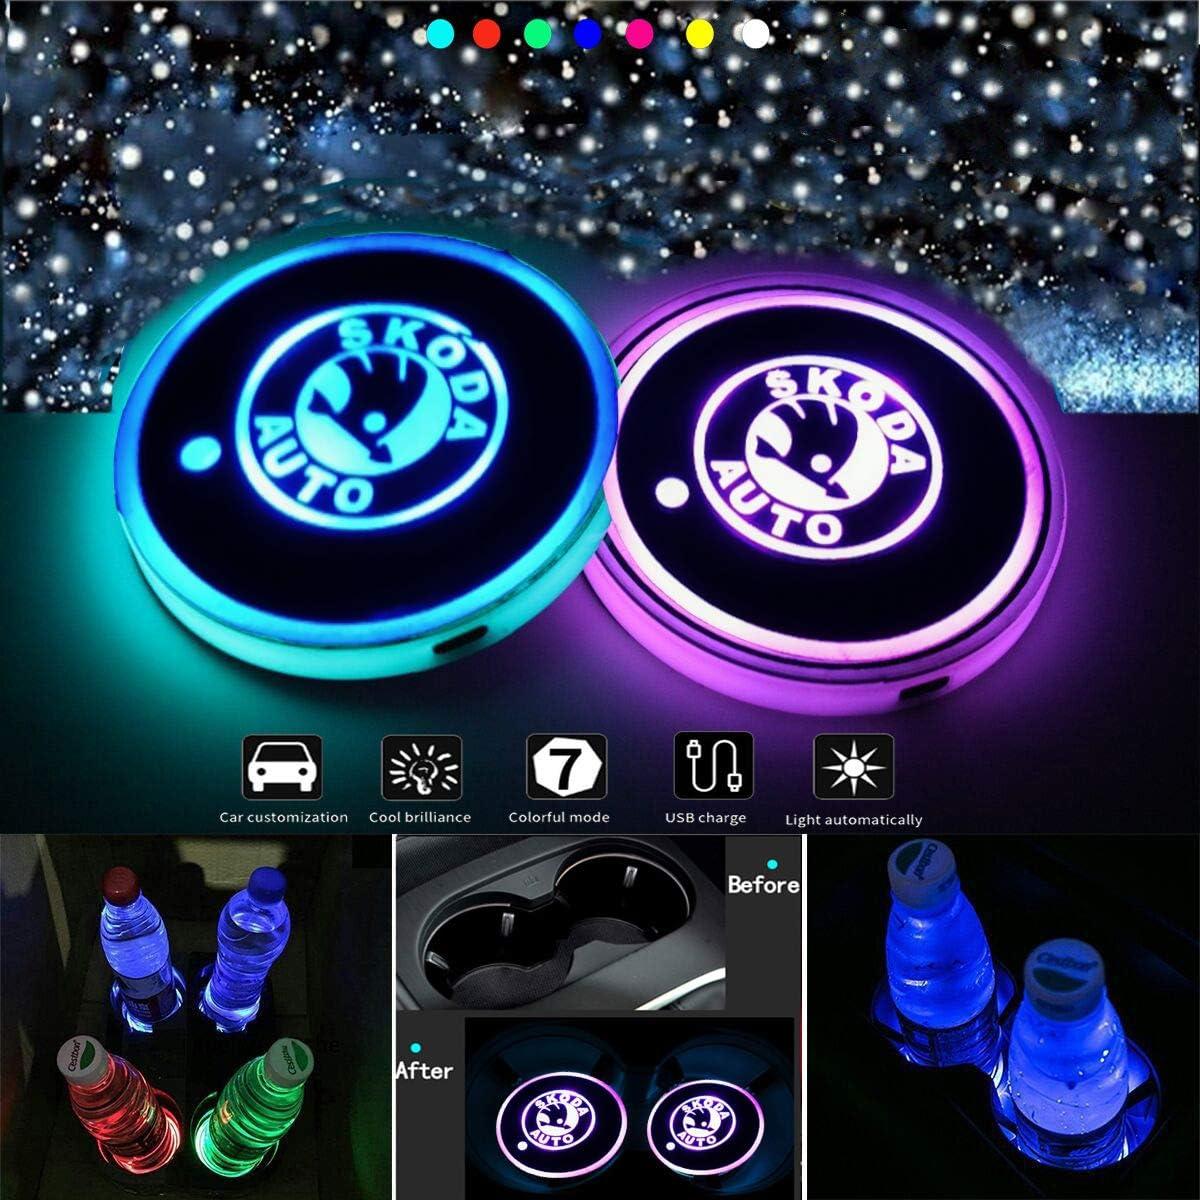 J.MOSUYA Wasserdicht Getr/änkehalter Auto LED Untersetzer 7 Farben USB Lade Becherhalter Lumineszenz Getr/änke Halter LED innenbeleuchtung Auto Atmosph/äre Lampe Licht,K